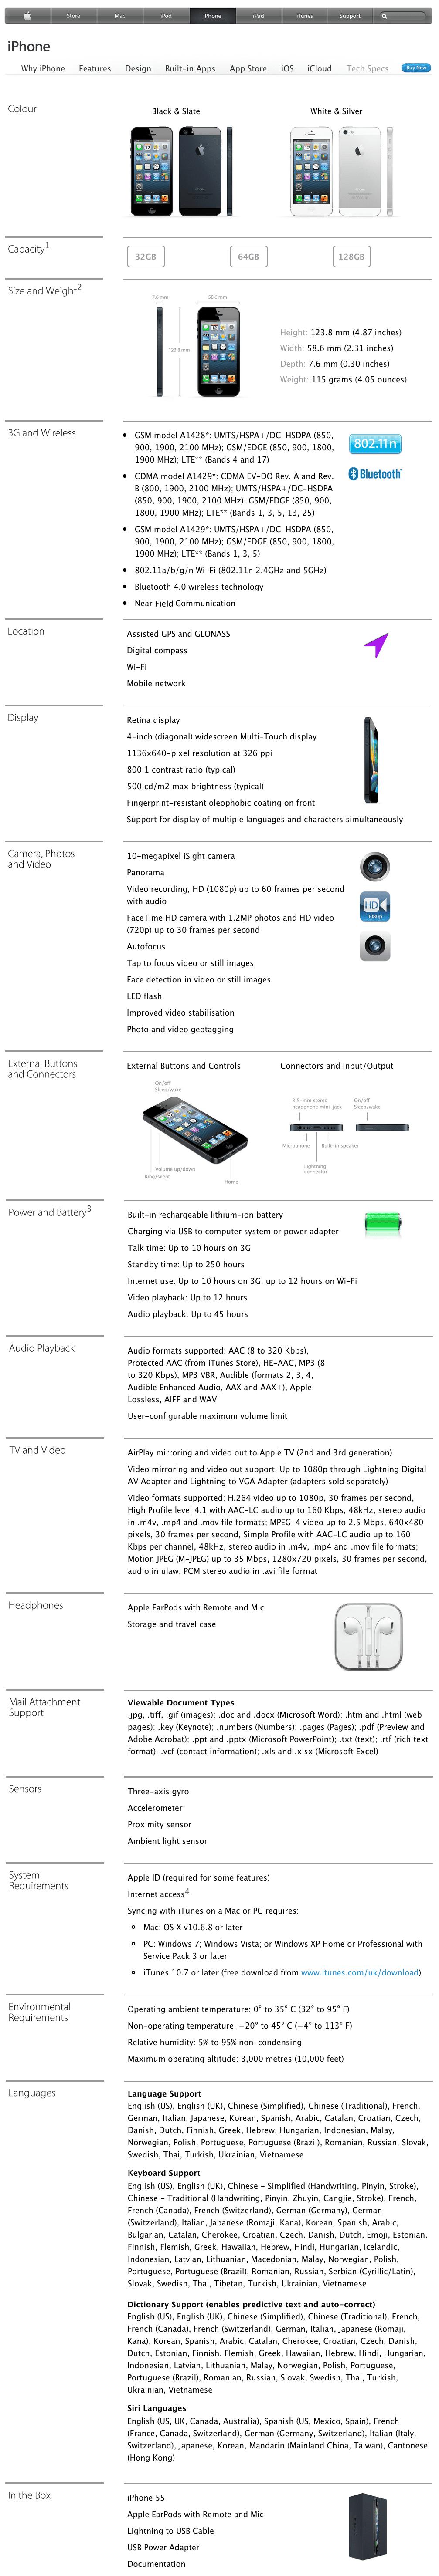 iPhone5s screenshot